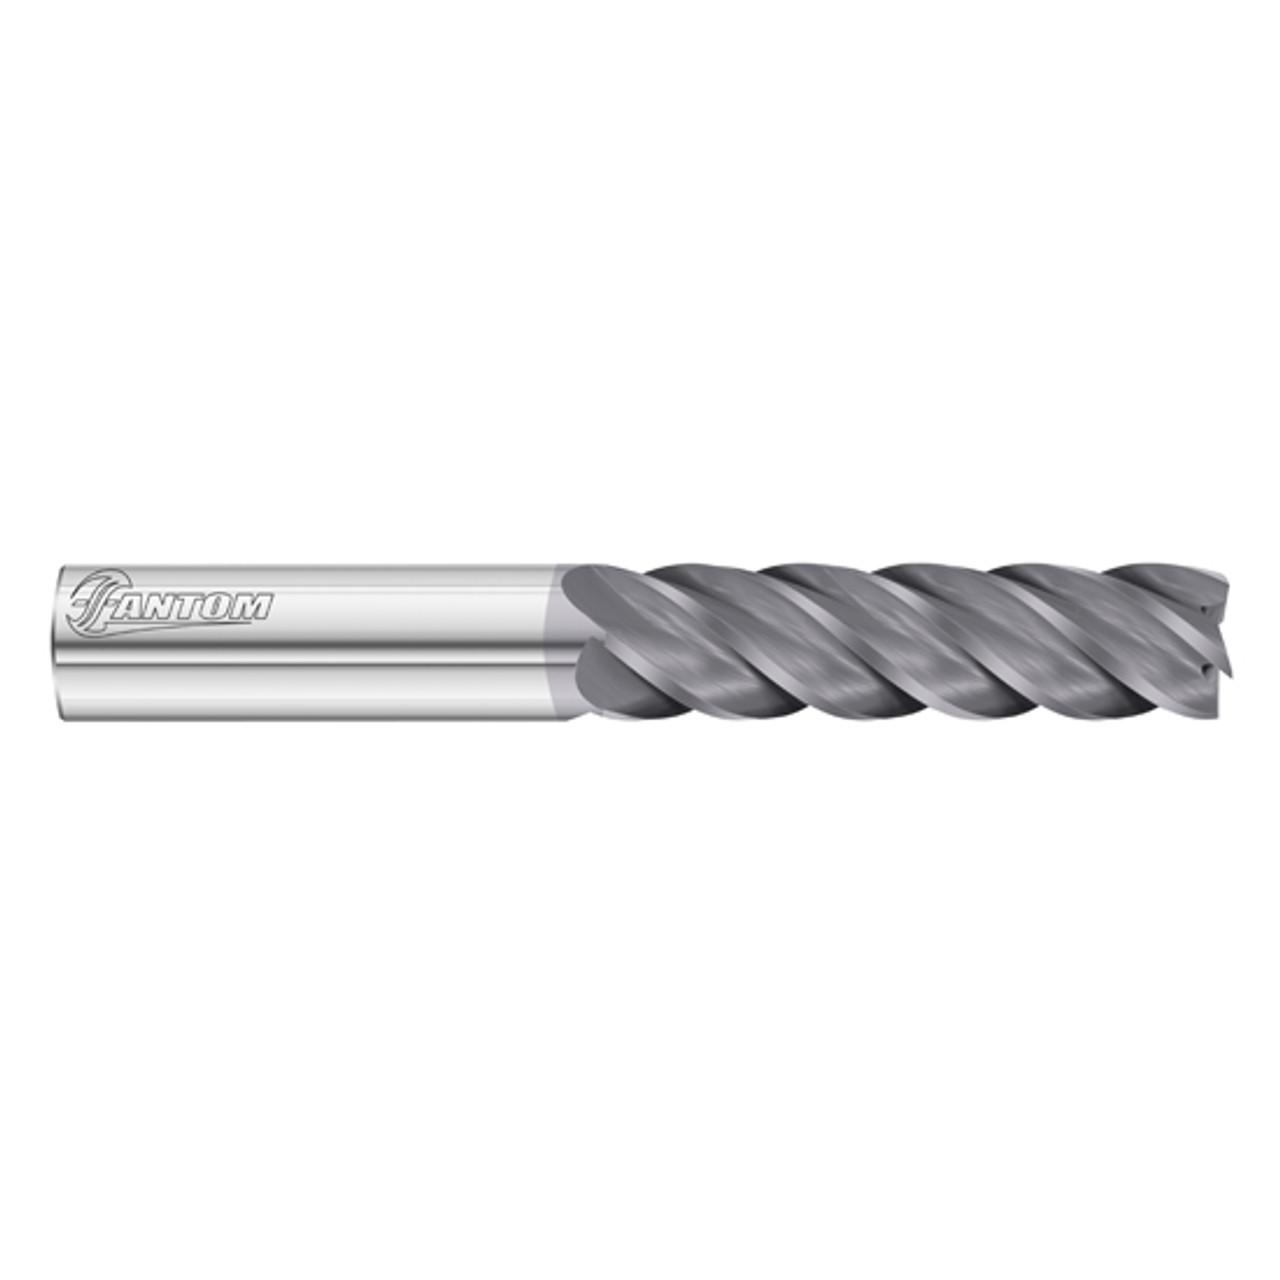 Fullerton Tool 34106 1//4 Diameter x 1//4 Shank x 3//4 LOC x 2-1//2 OAL 5 Flute FC18 Solid Carbide Radius End Mill